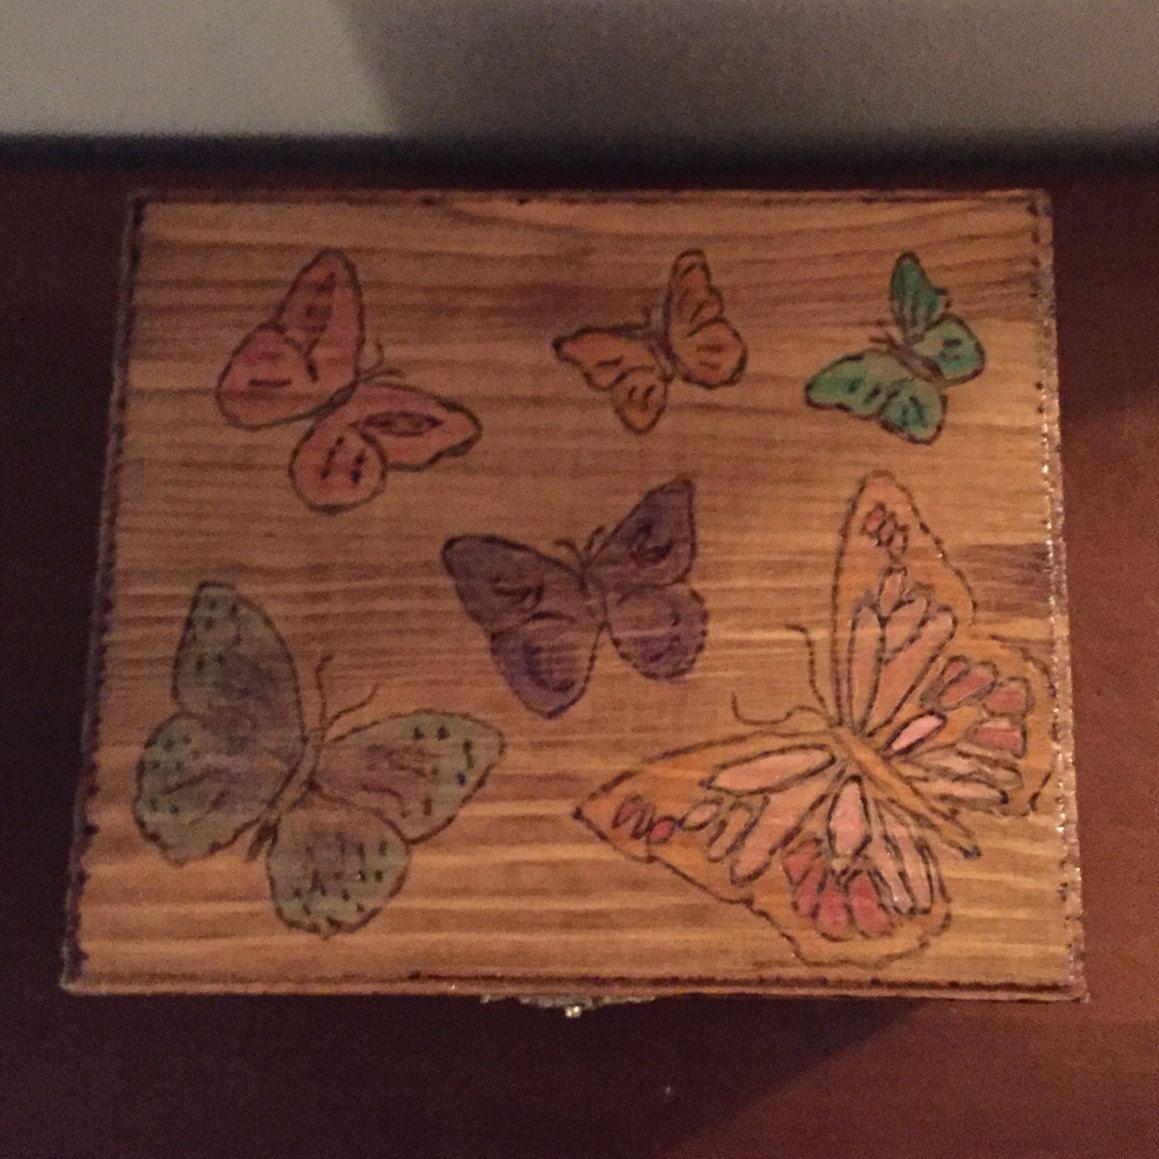 stash box,weed box,secert stash box,jewelry box,wooden jewelry box ...